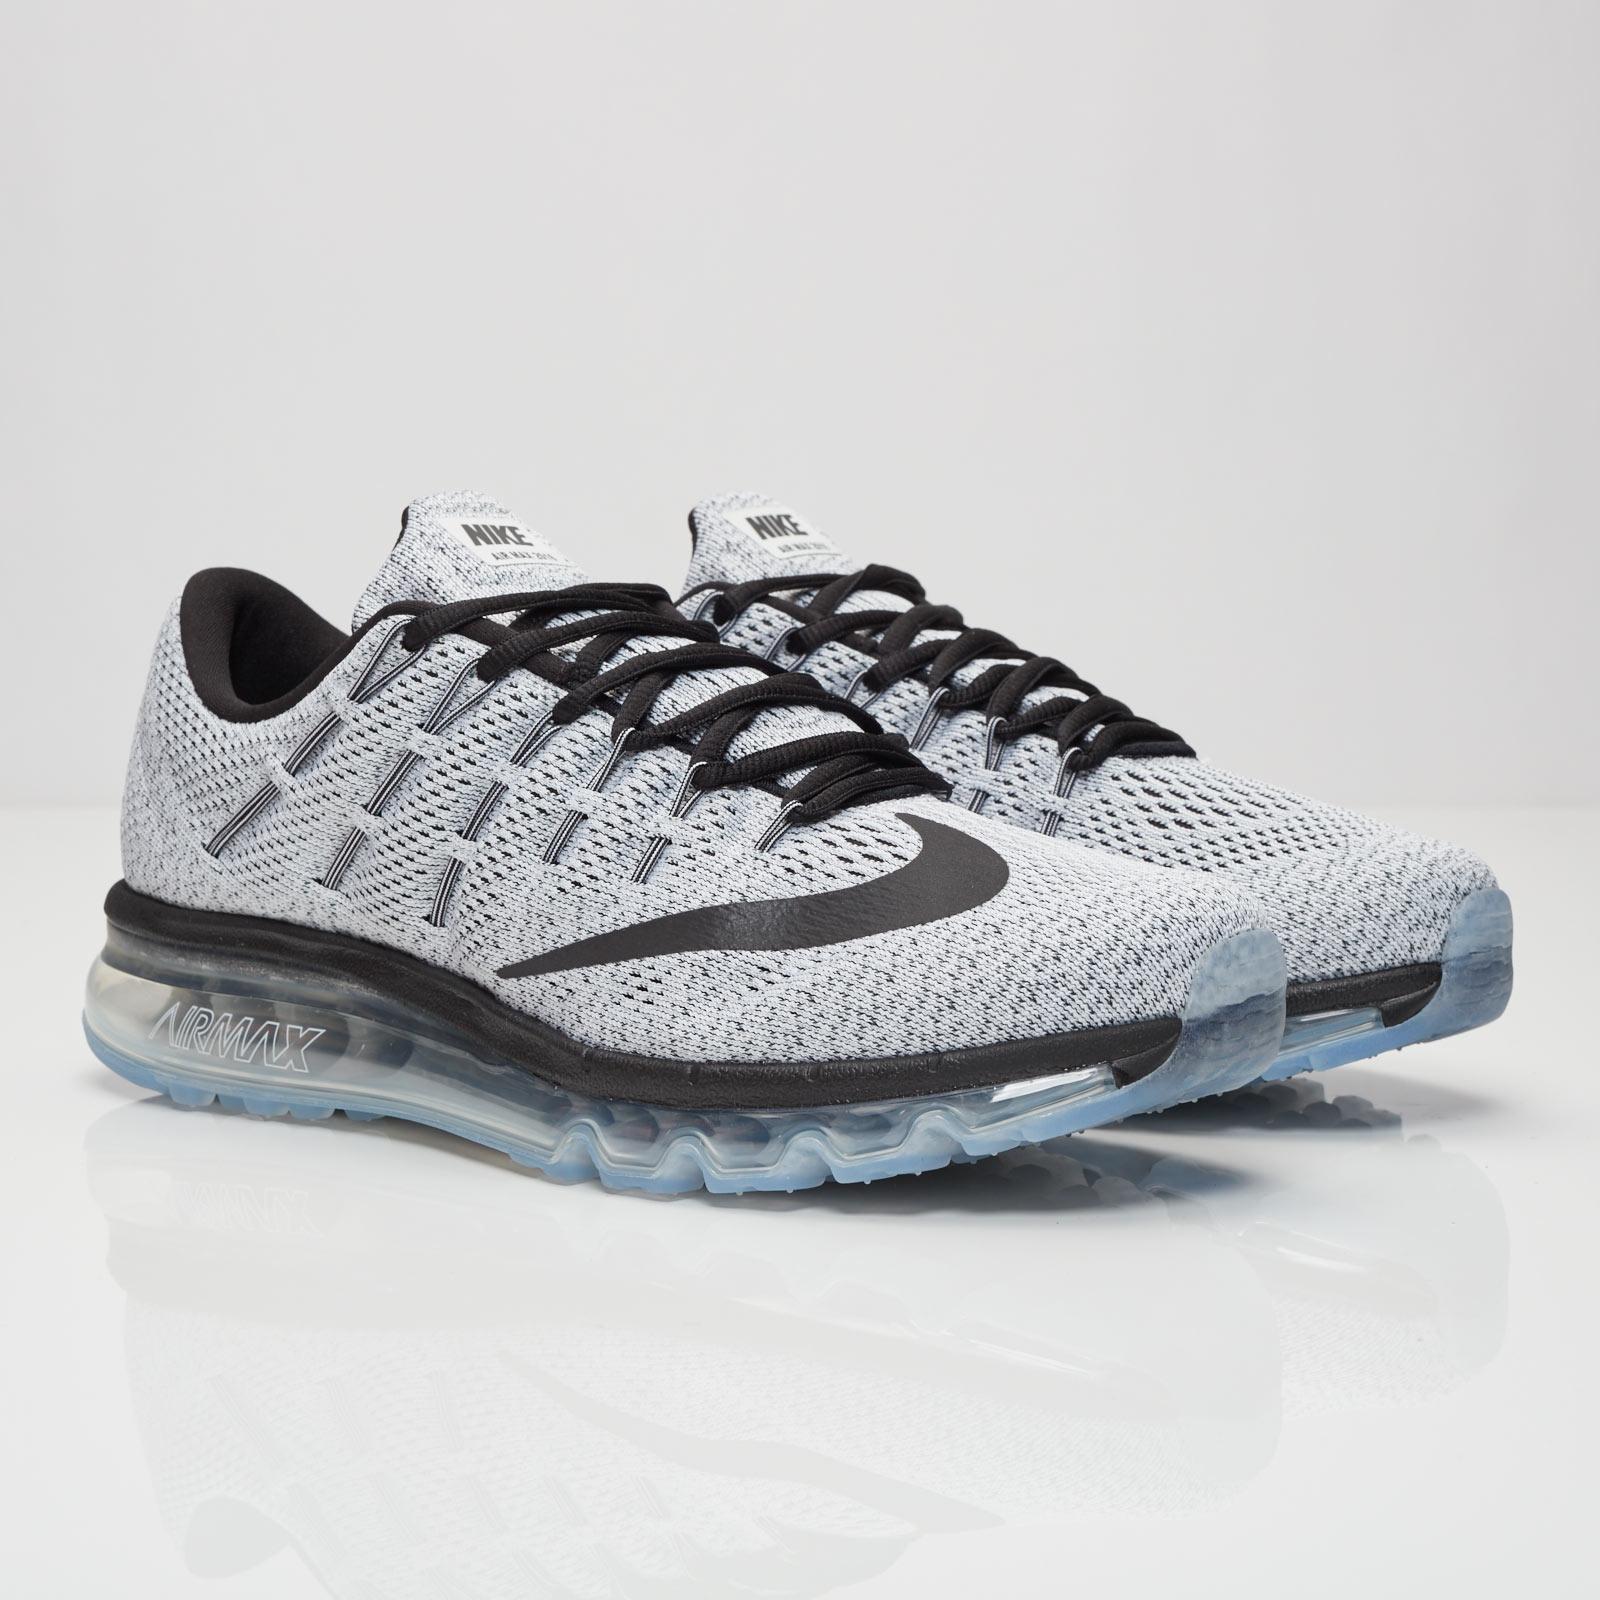 Nike Air Max 2016 - 806771-101 - Sneakersnstuff  58839c4dd